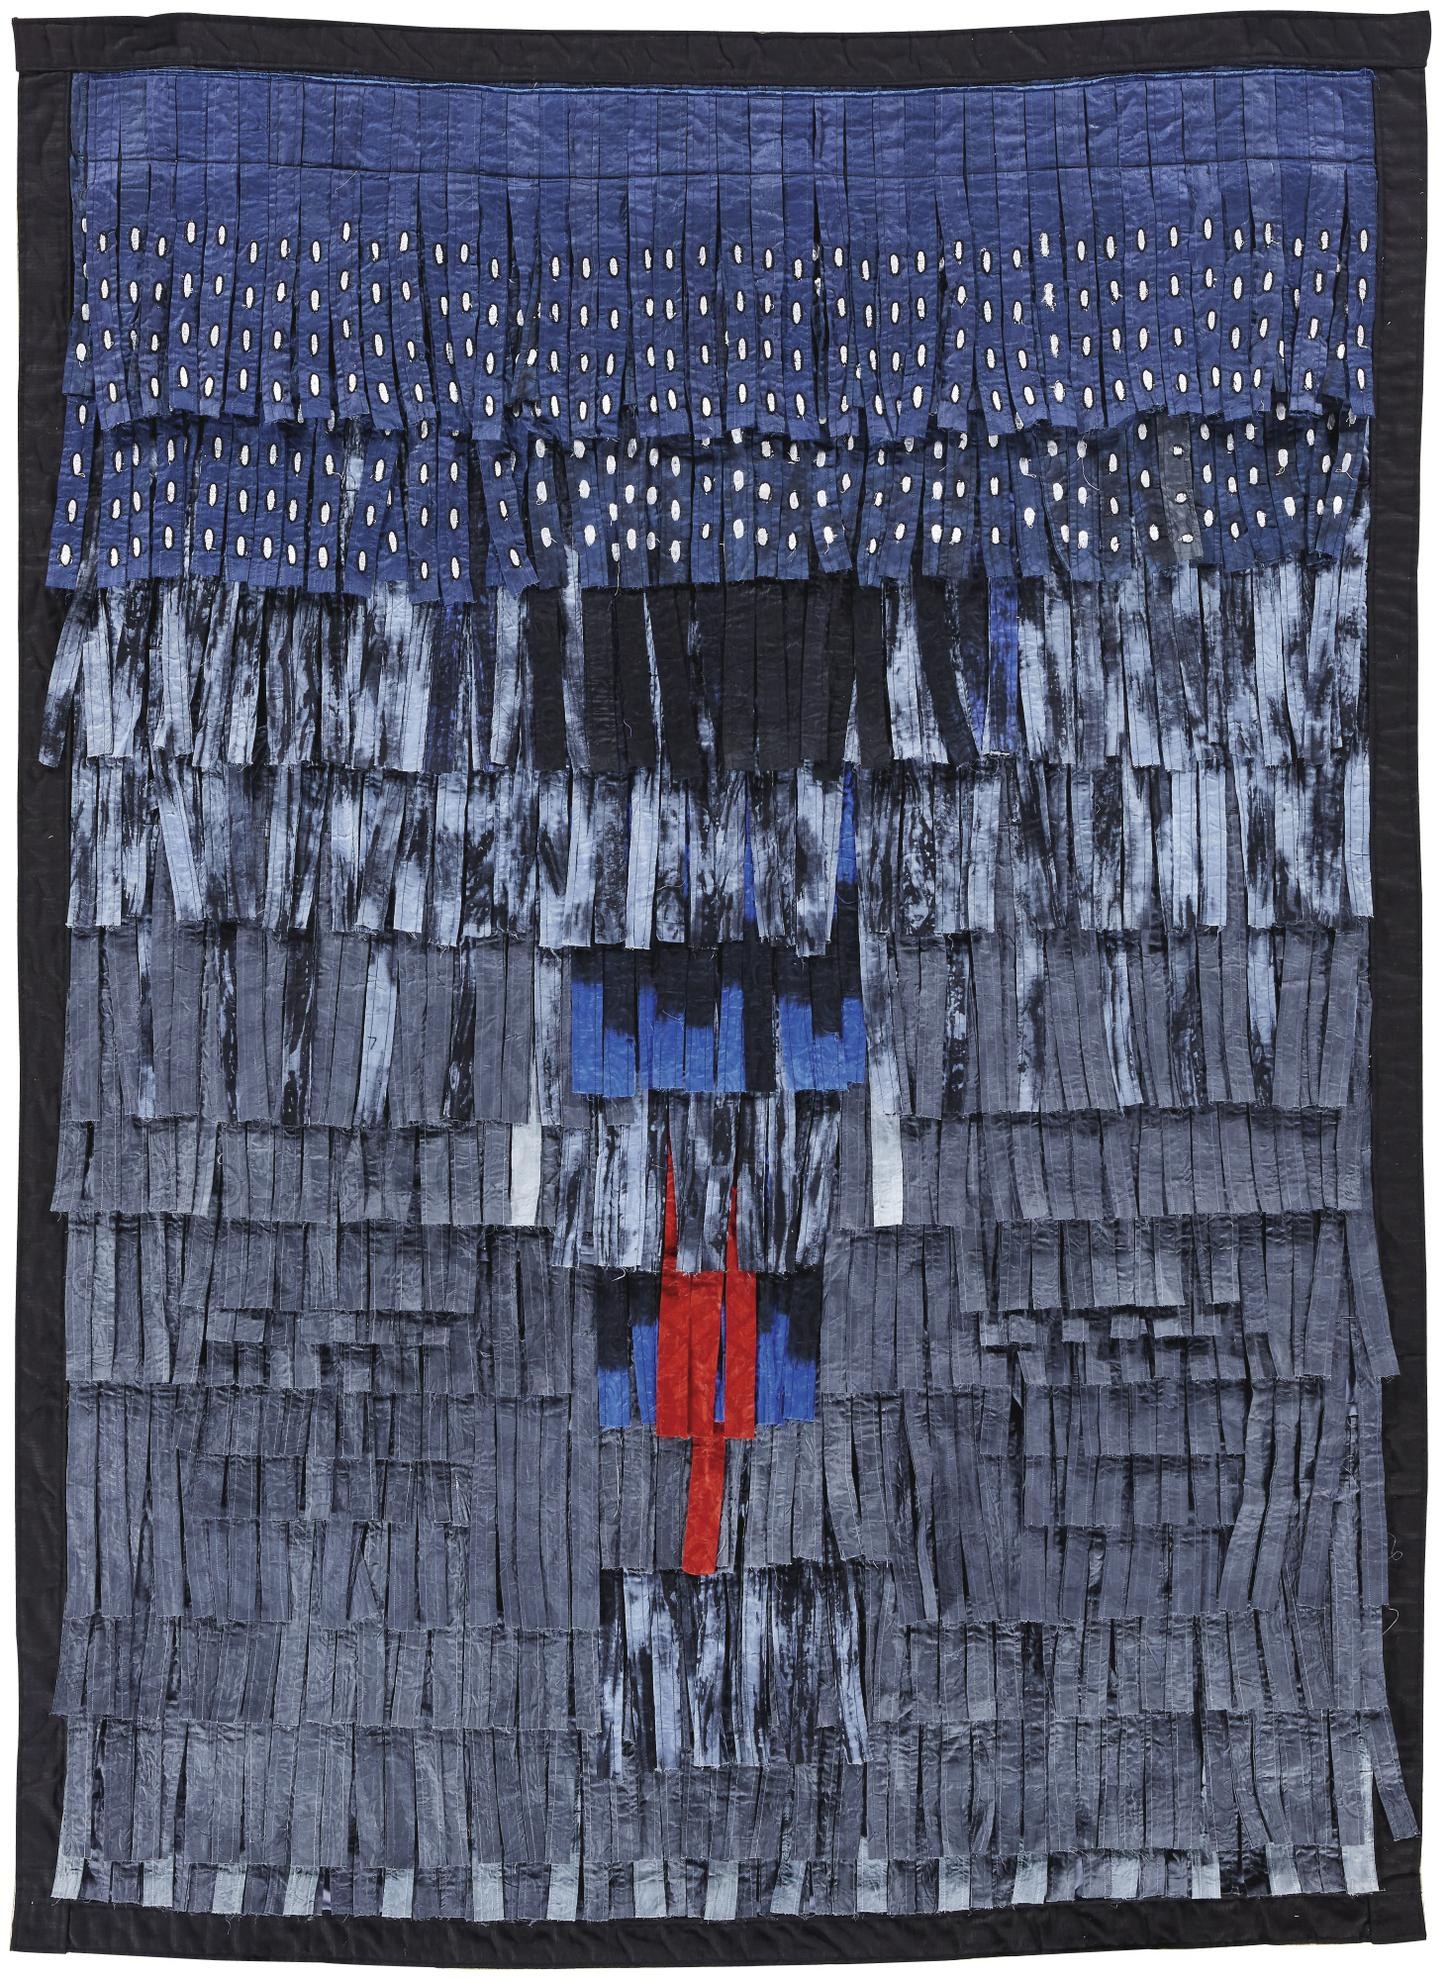 Abdoulaye Konate-Composition No. 7-2012